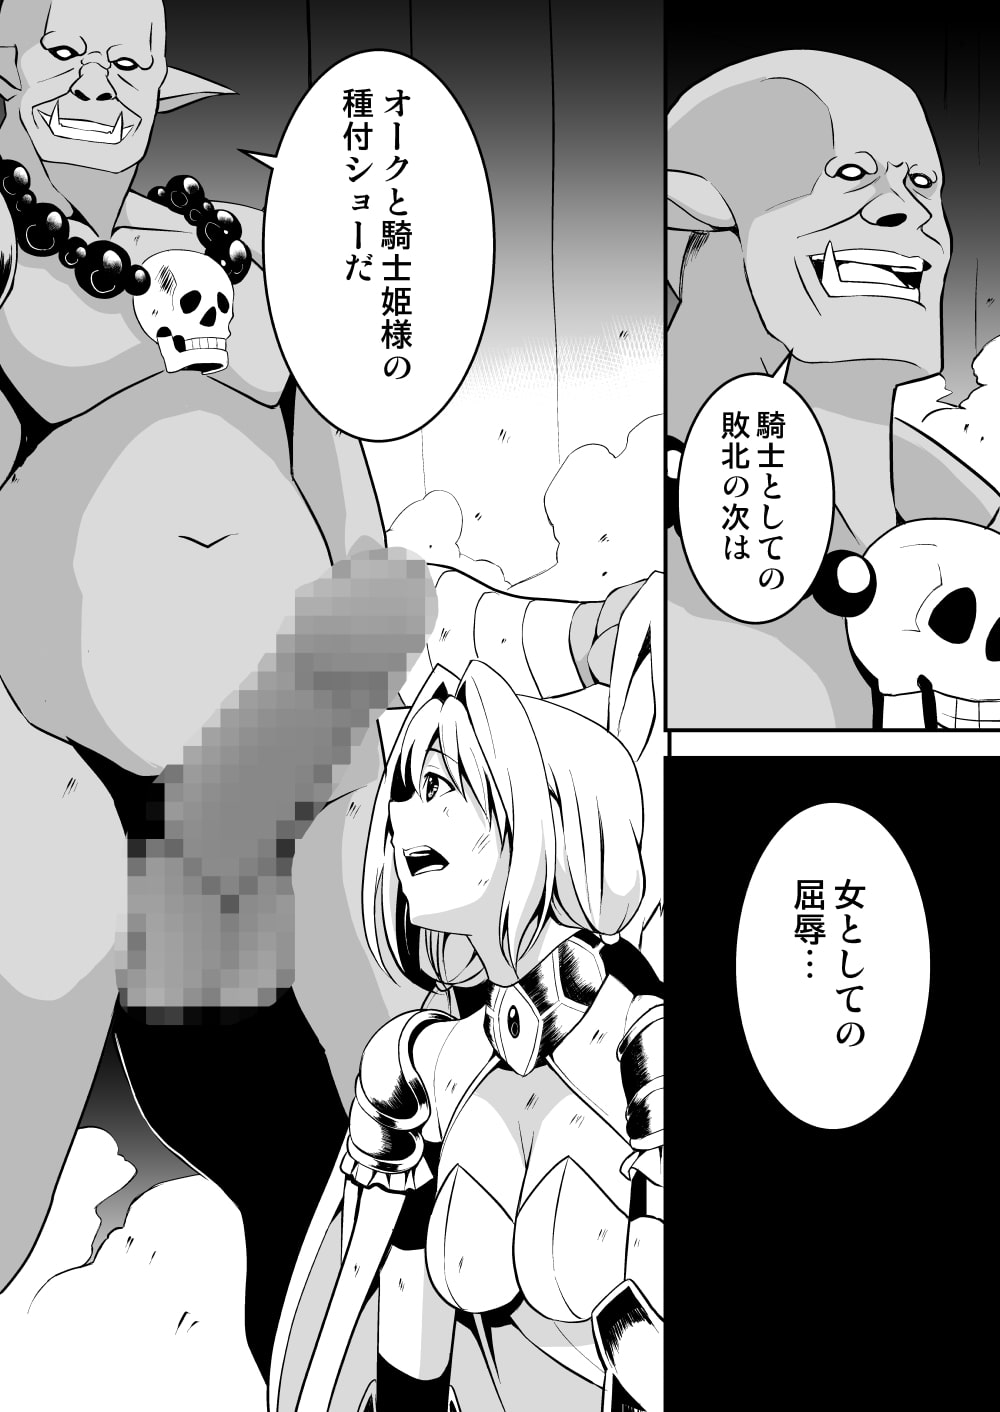 RJ324147 姫騎士さまはオークの子供を孕みたい [20210424]